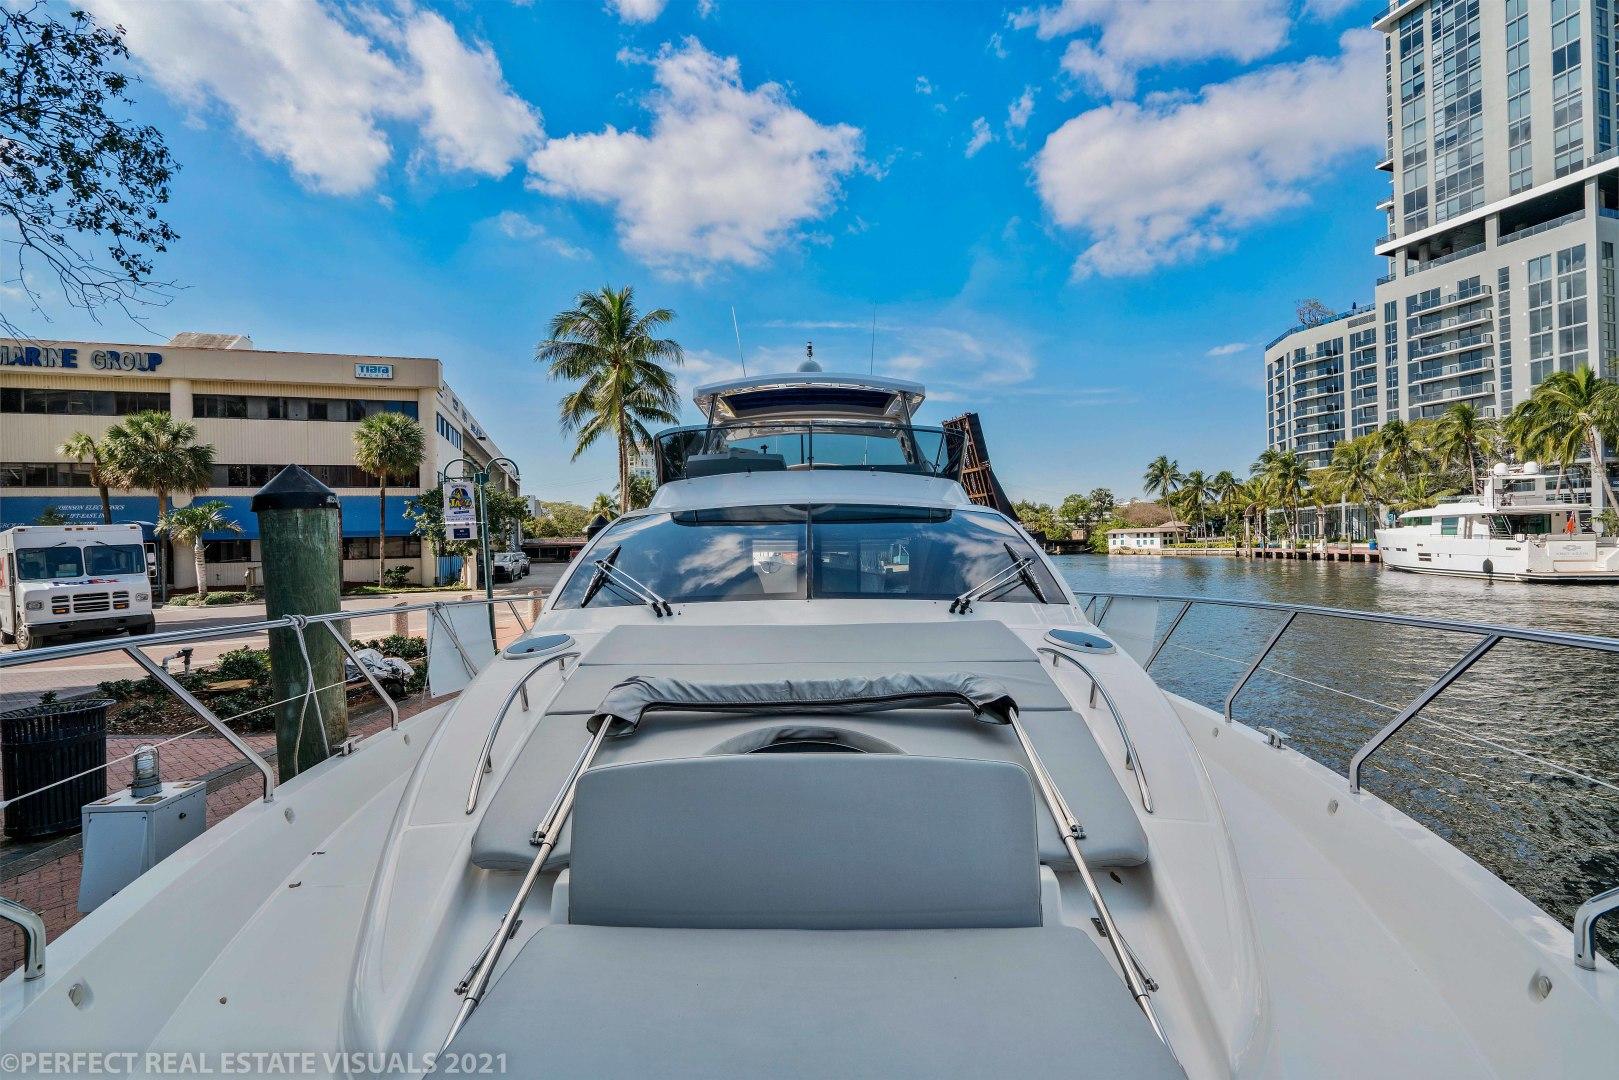 Schaefer-640 2017 -Fort Lauderdale-United States-1600583 | Thumbnail